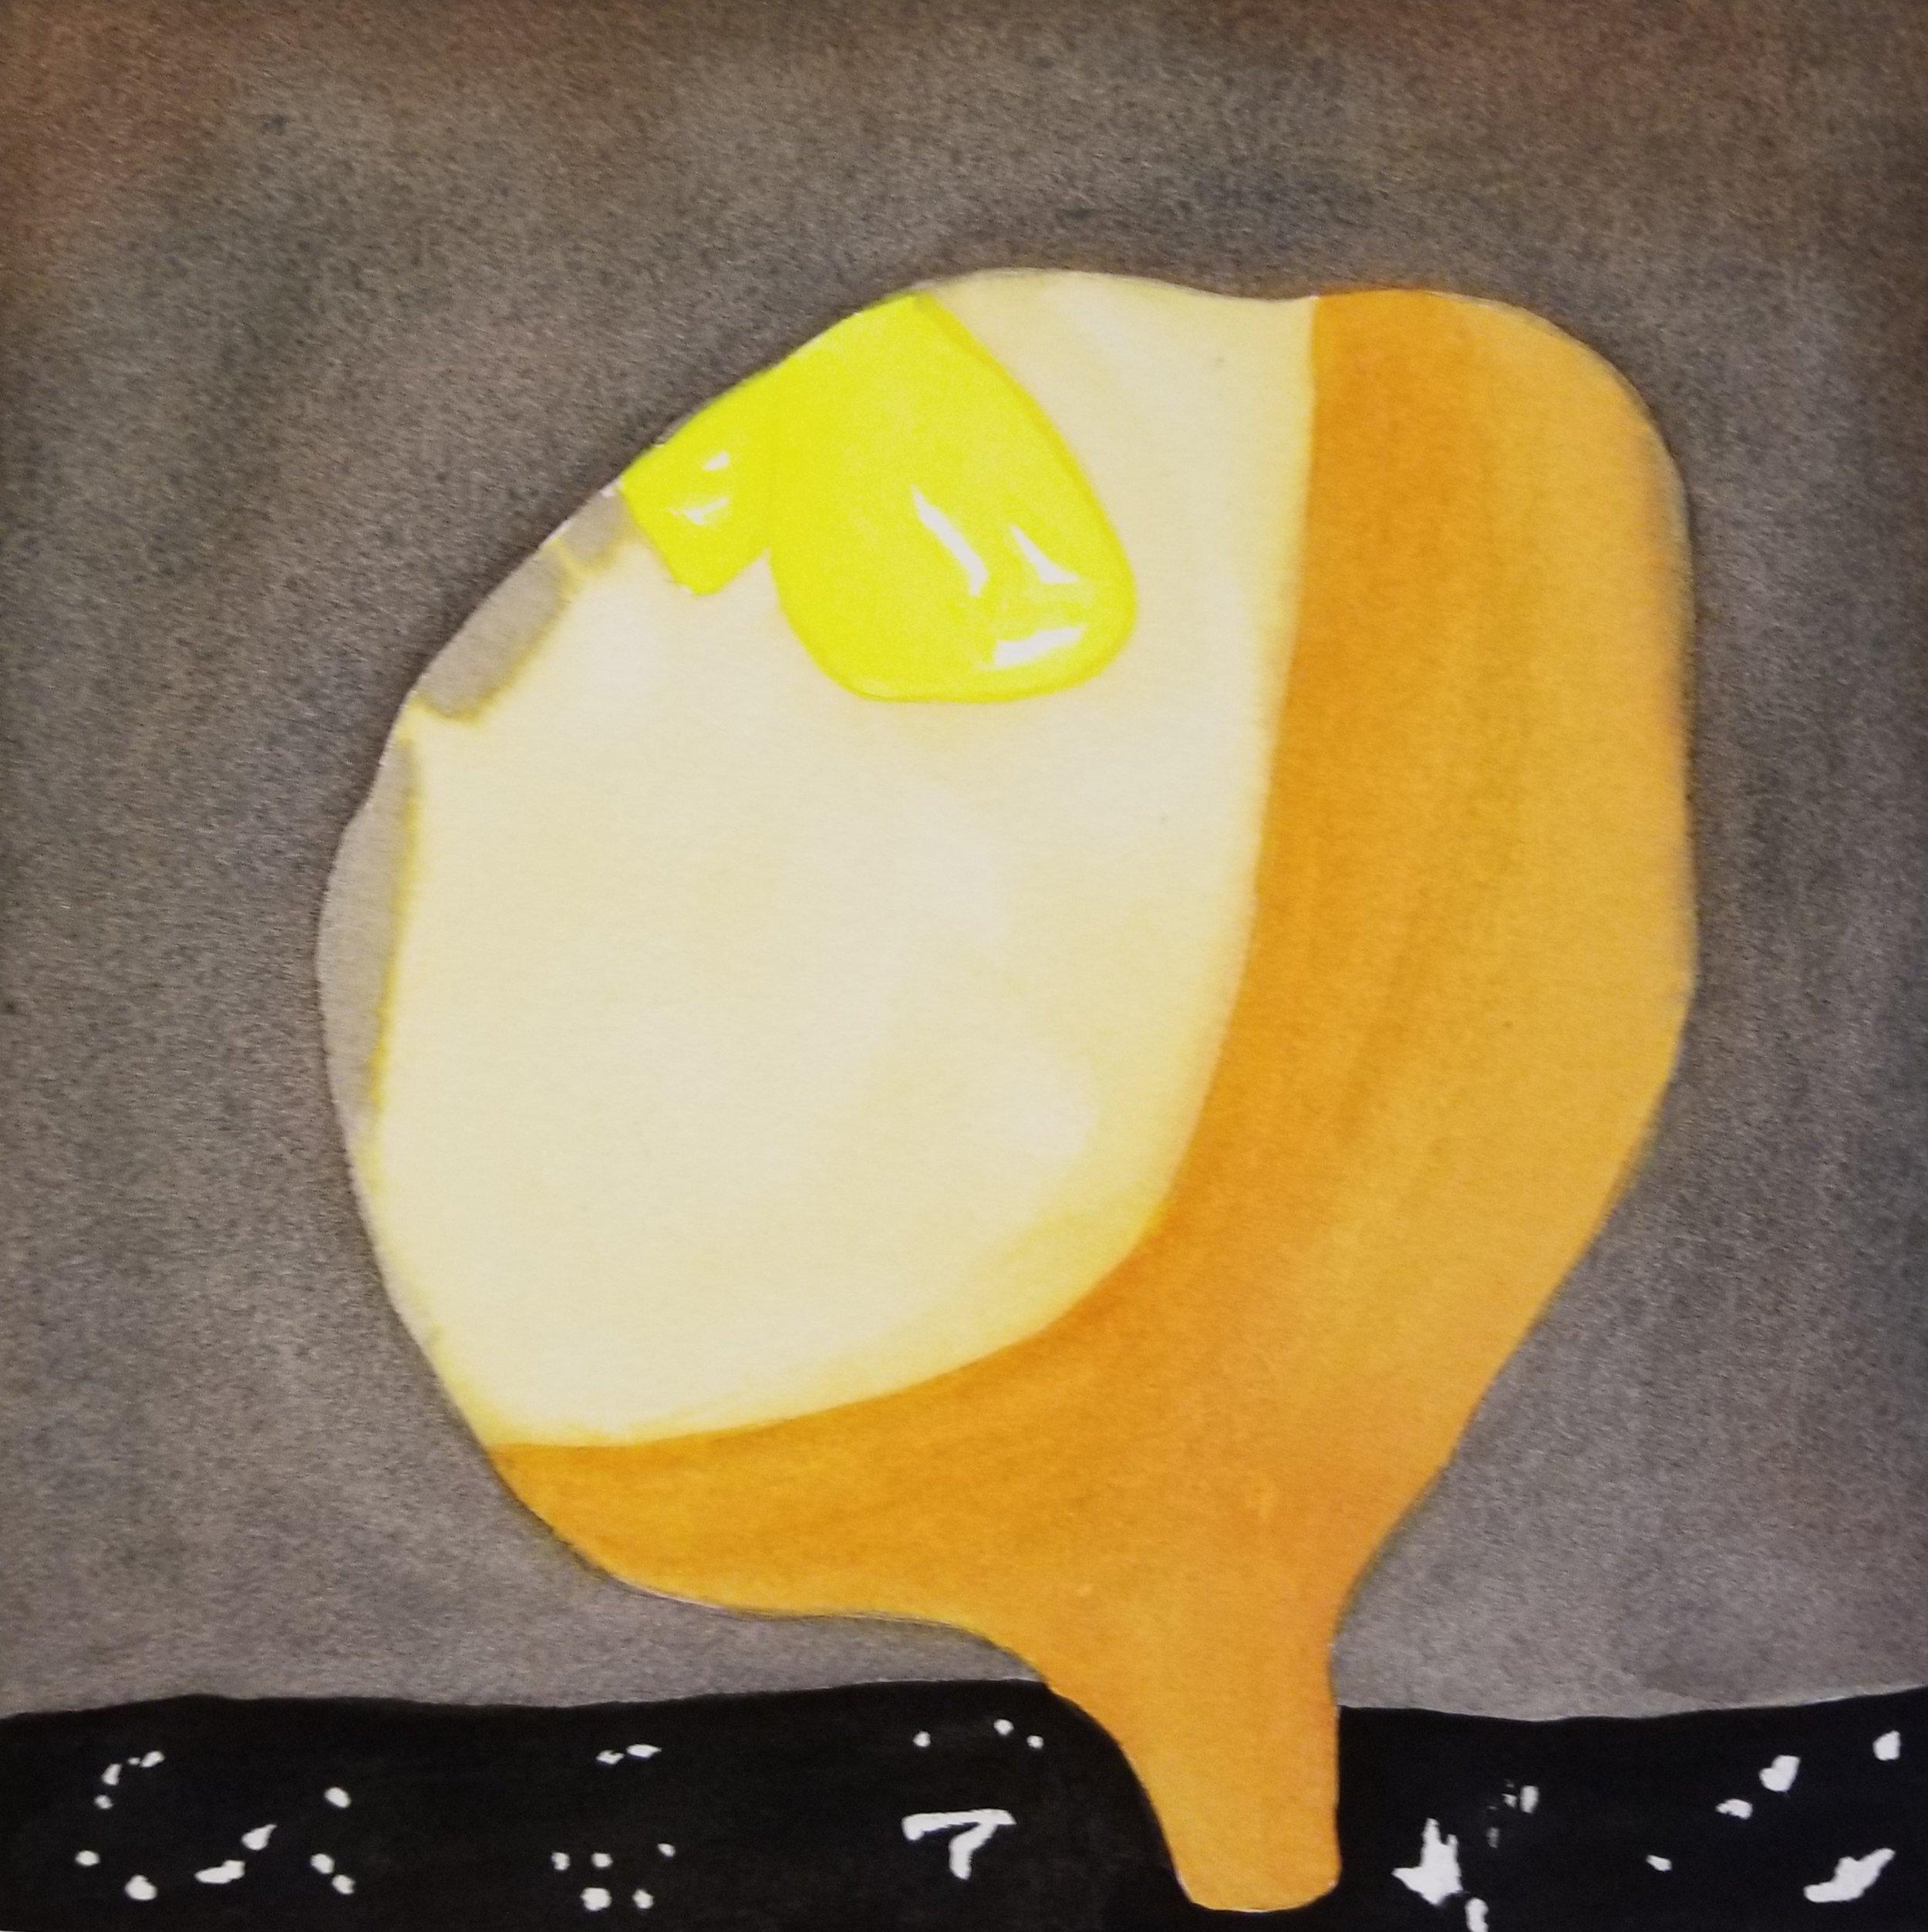 Color Study No. 1, 2018, watercolor, 9 x 9 in, SOLD